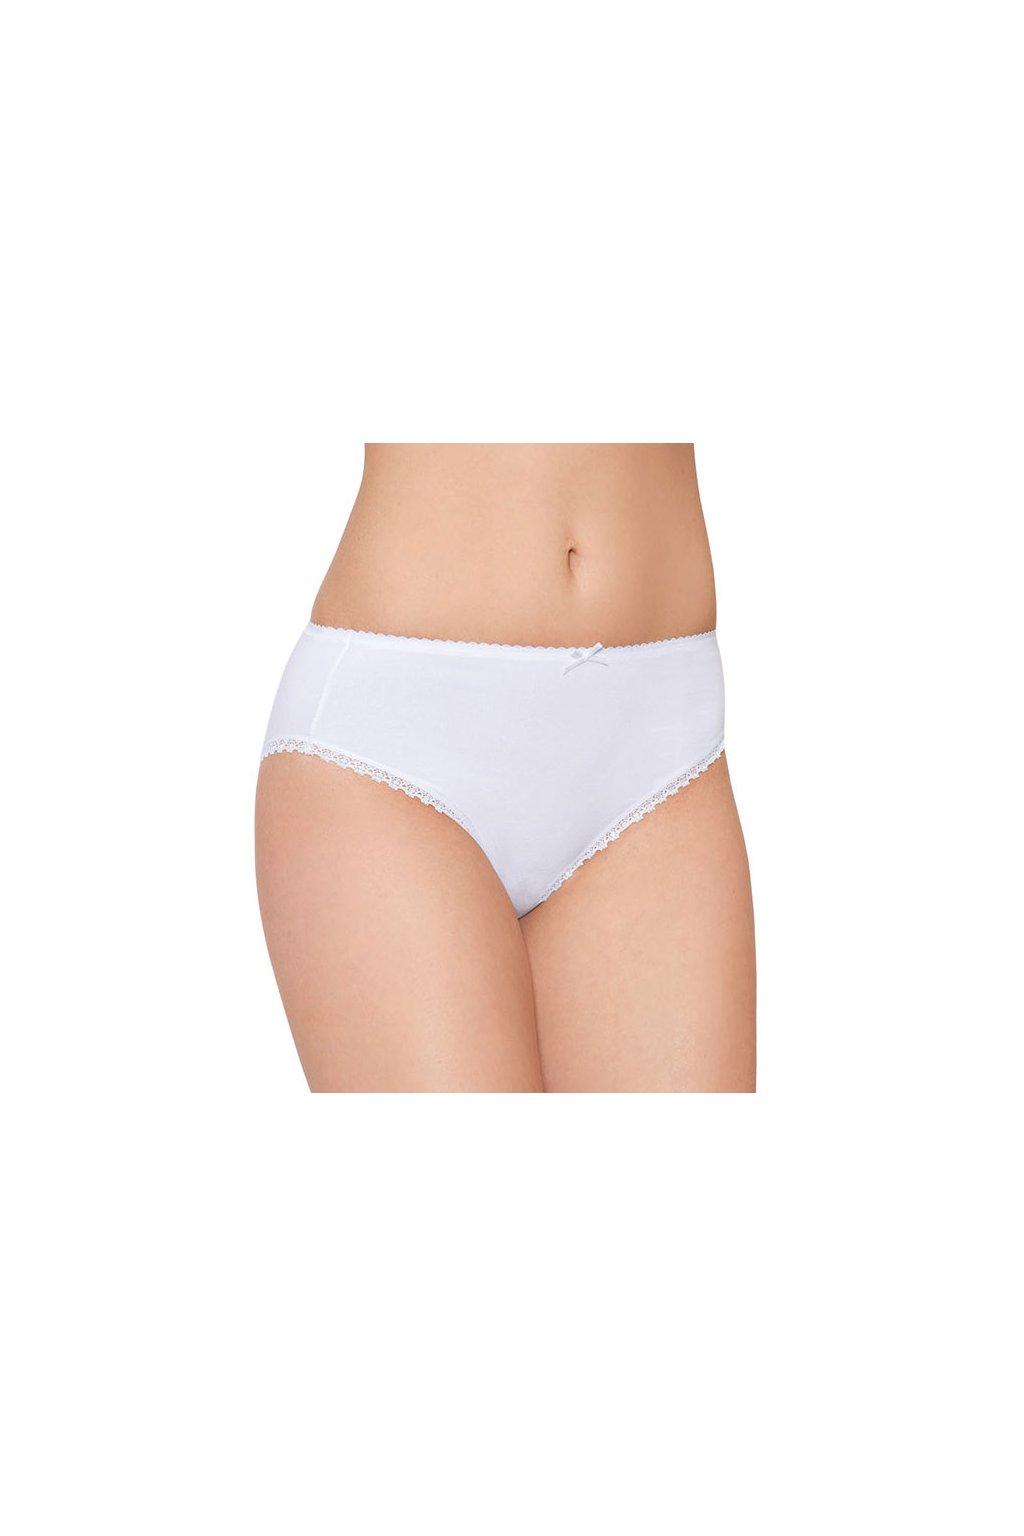 Dámské kalhotky, 10062 1, bílá